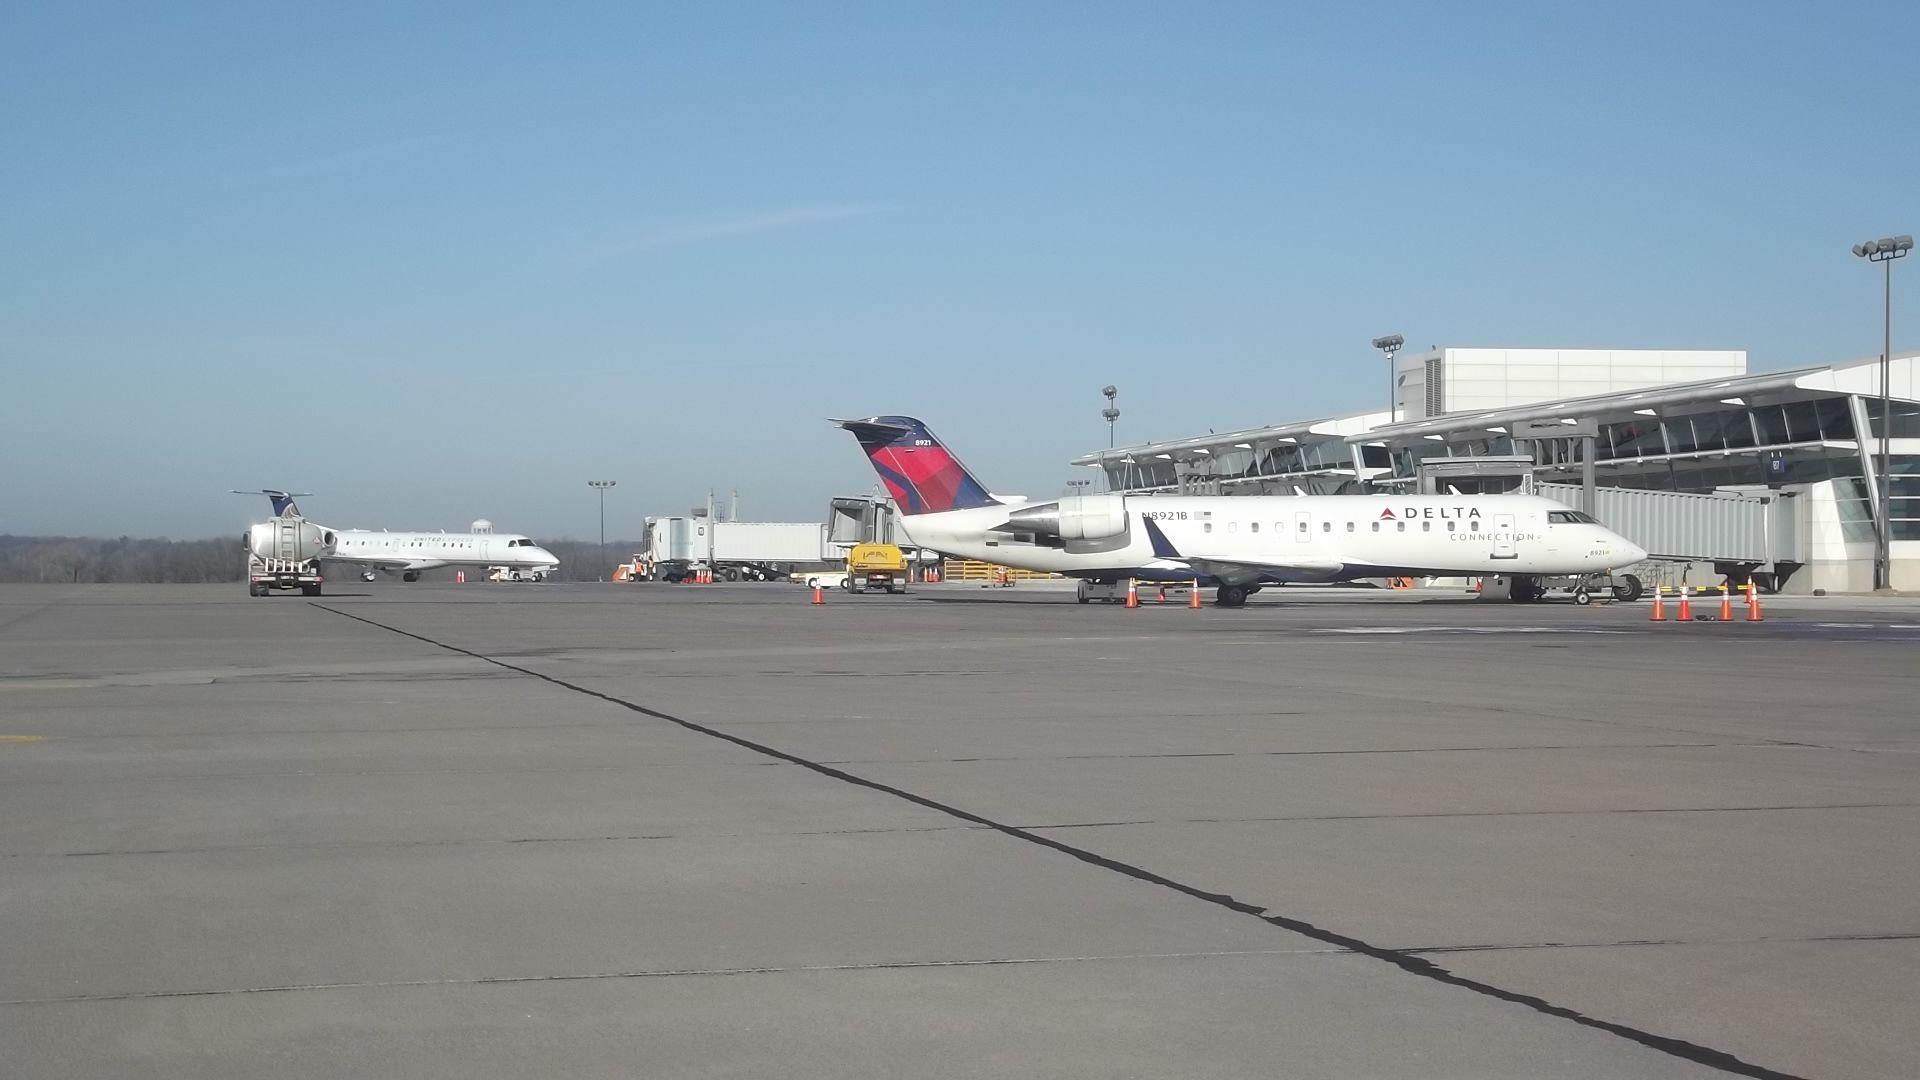 Delta At The Gate At The Quad City International Airport Moline Il Mli Quad Cities International Airport Quad